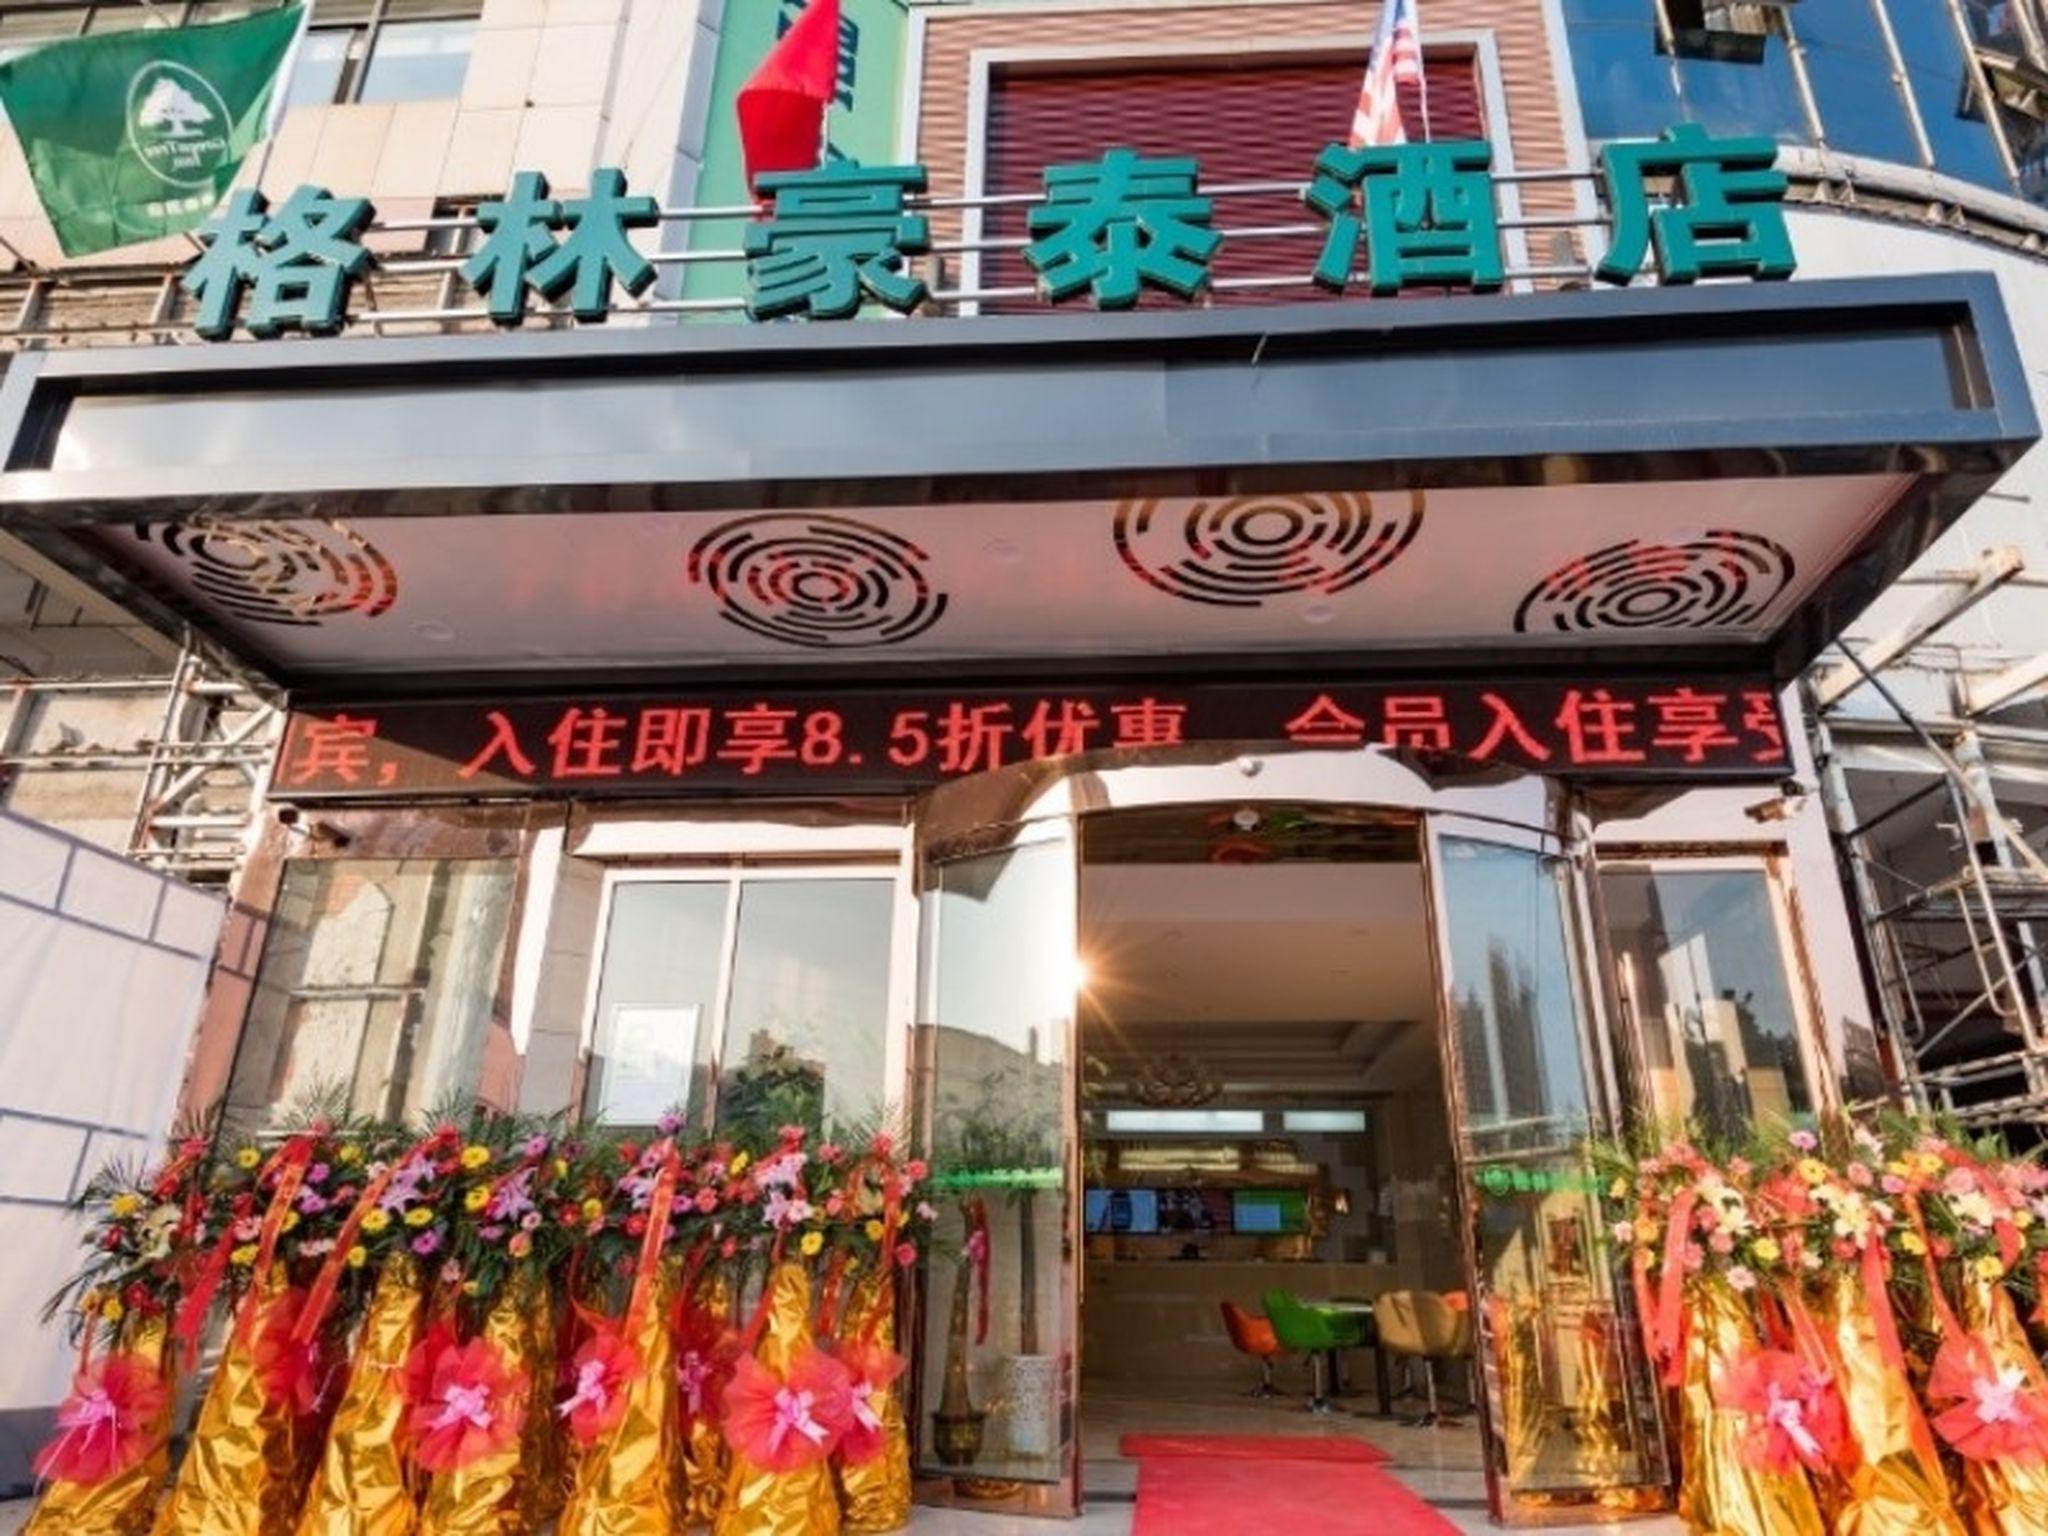 GreenTree Inn Maanshan High Speed Railway East Station Oushang Supermarket Business Hotel, Ma'anshan